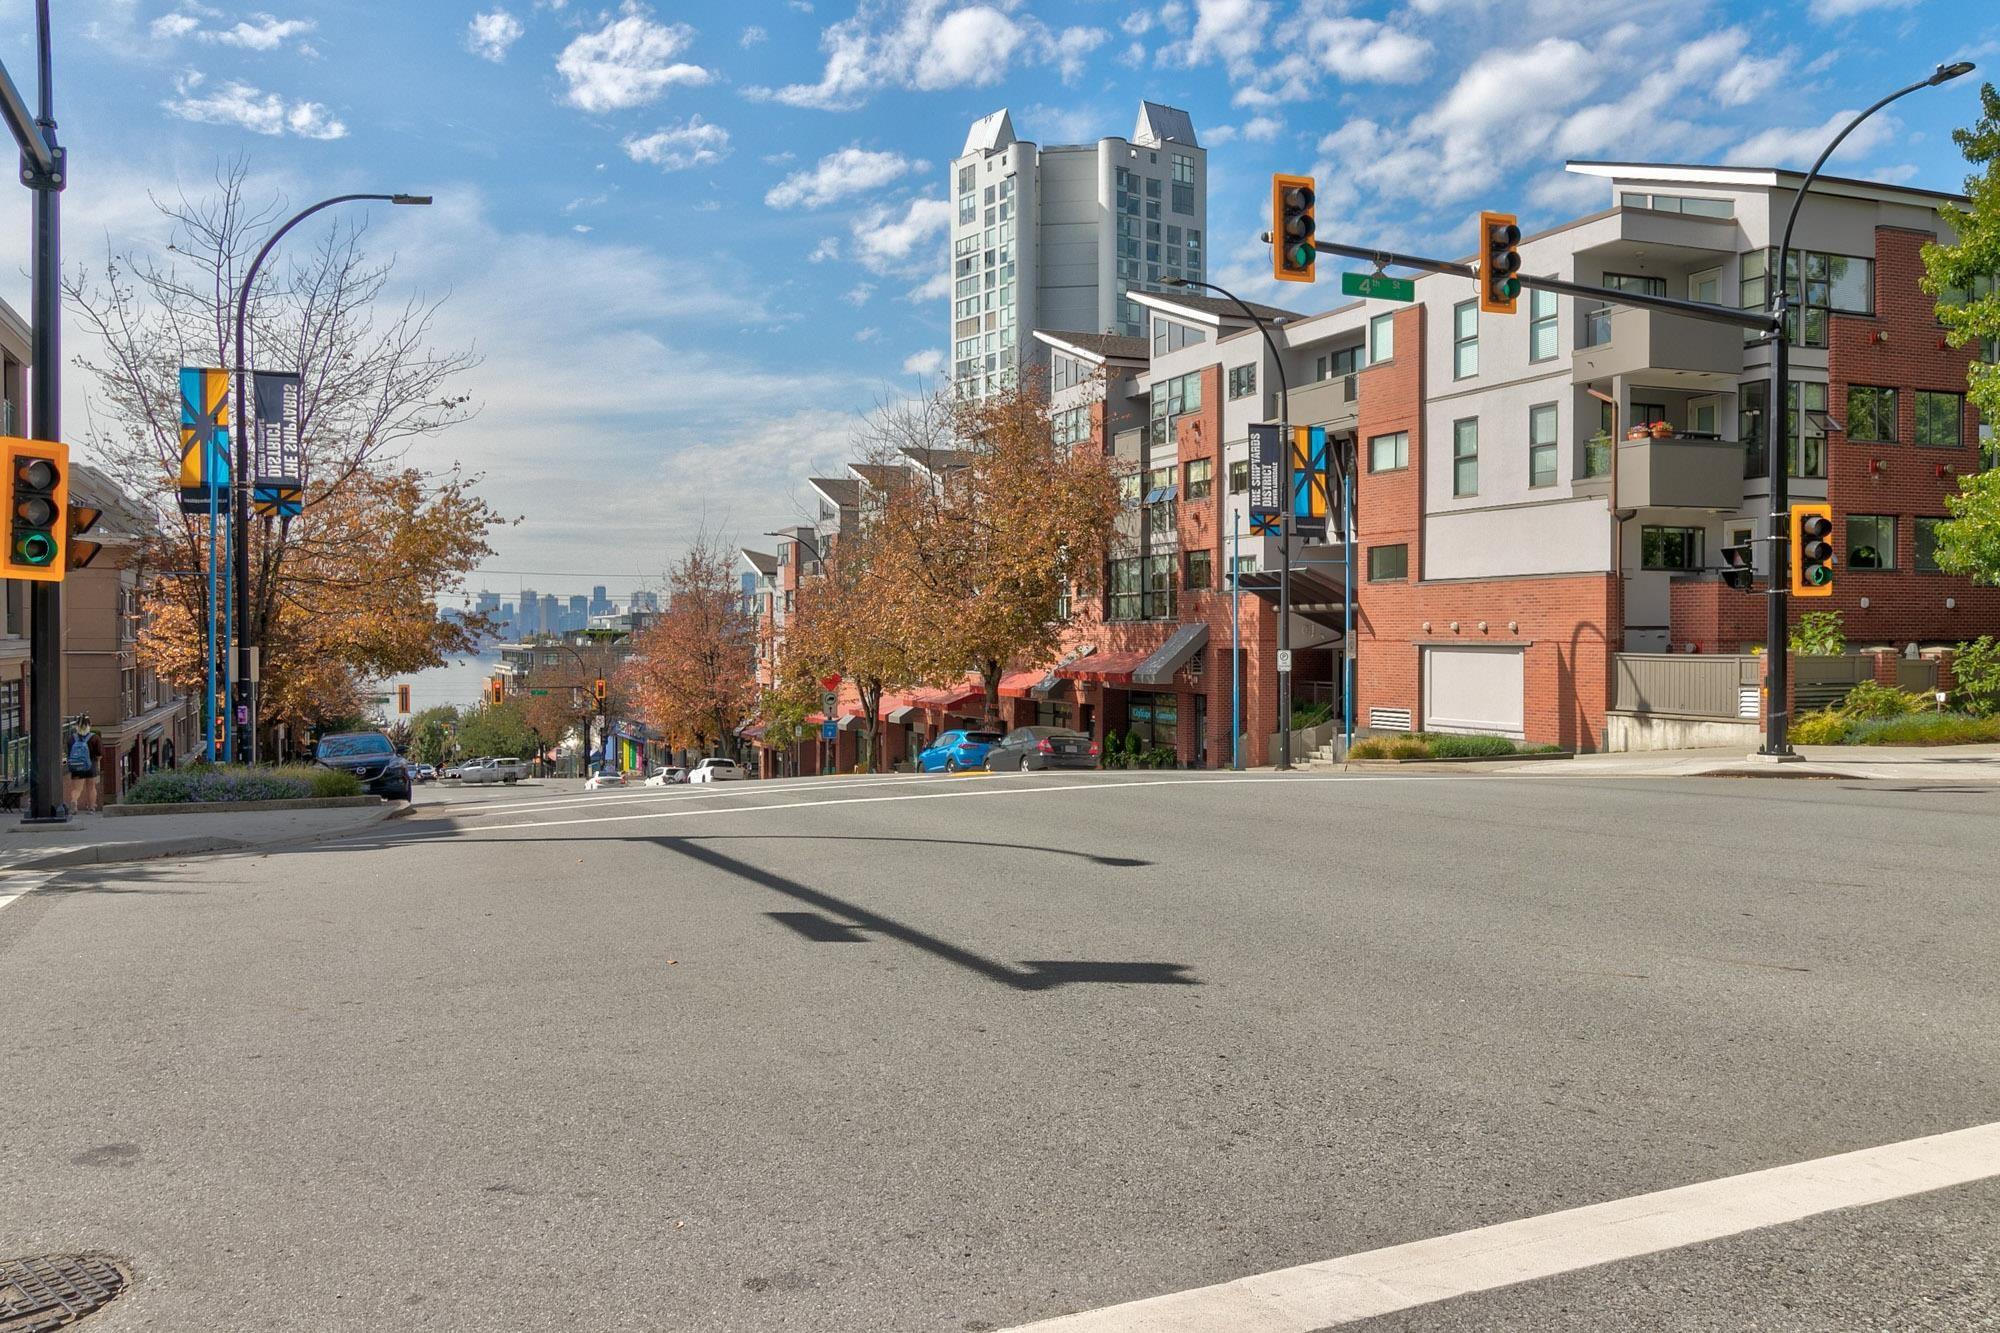 Listing image of 412 120 E 4TH STREET